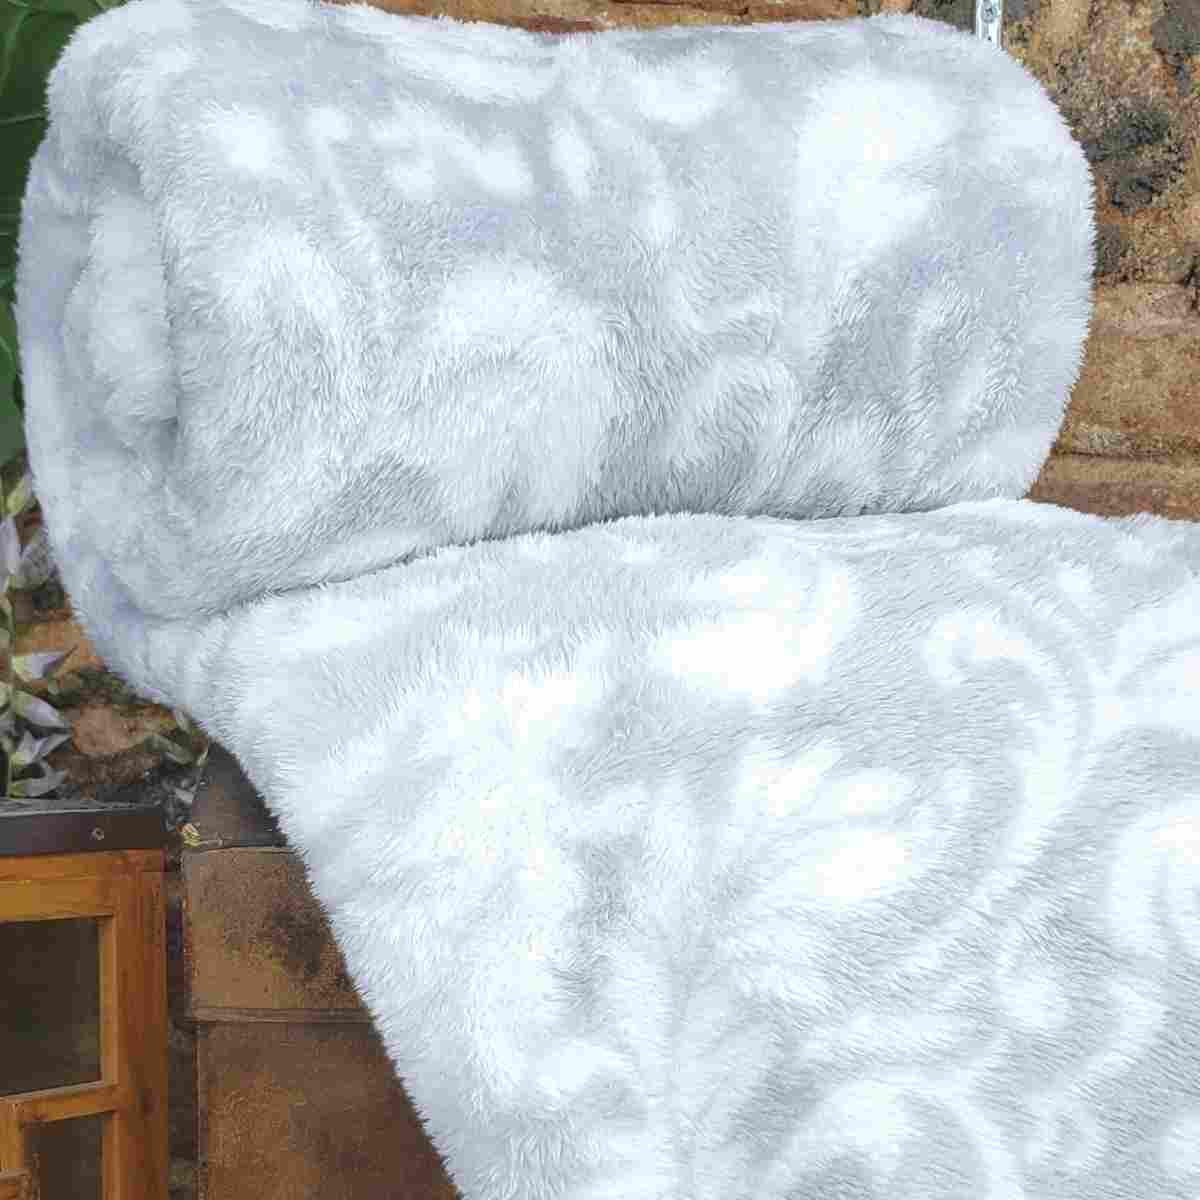 Cobertor MontBlanc Casal 180x220 - Cashmere